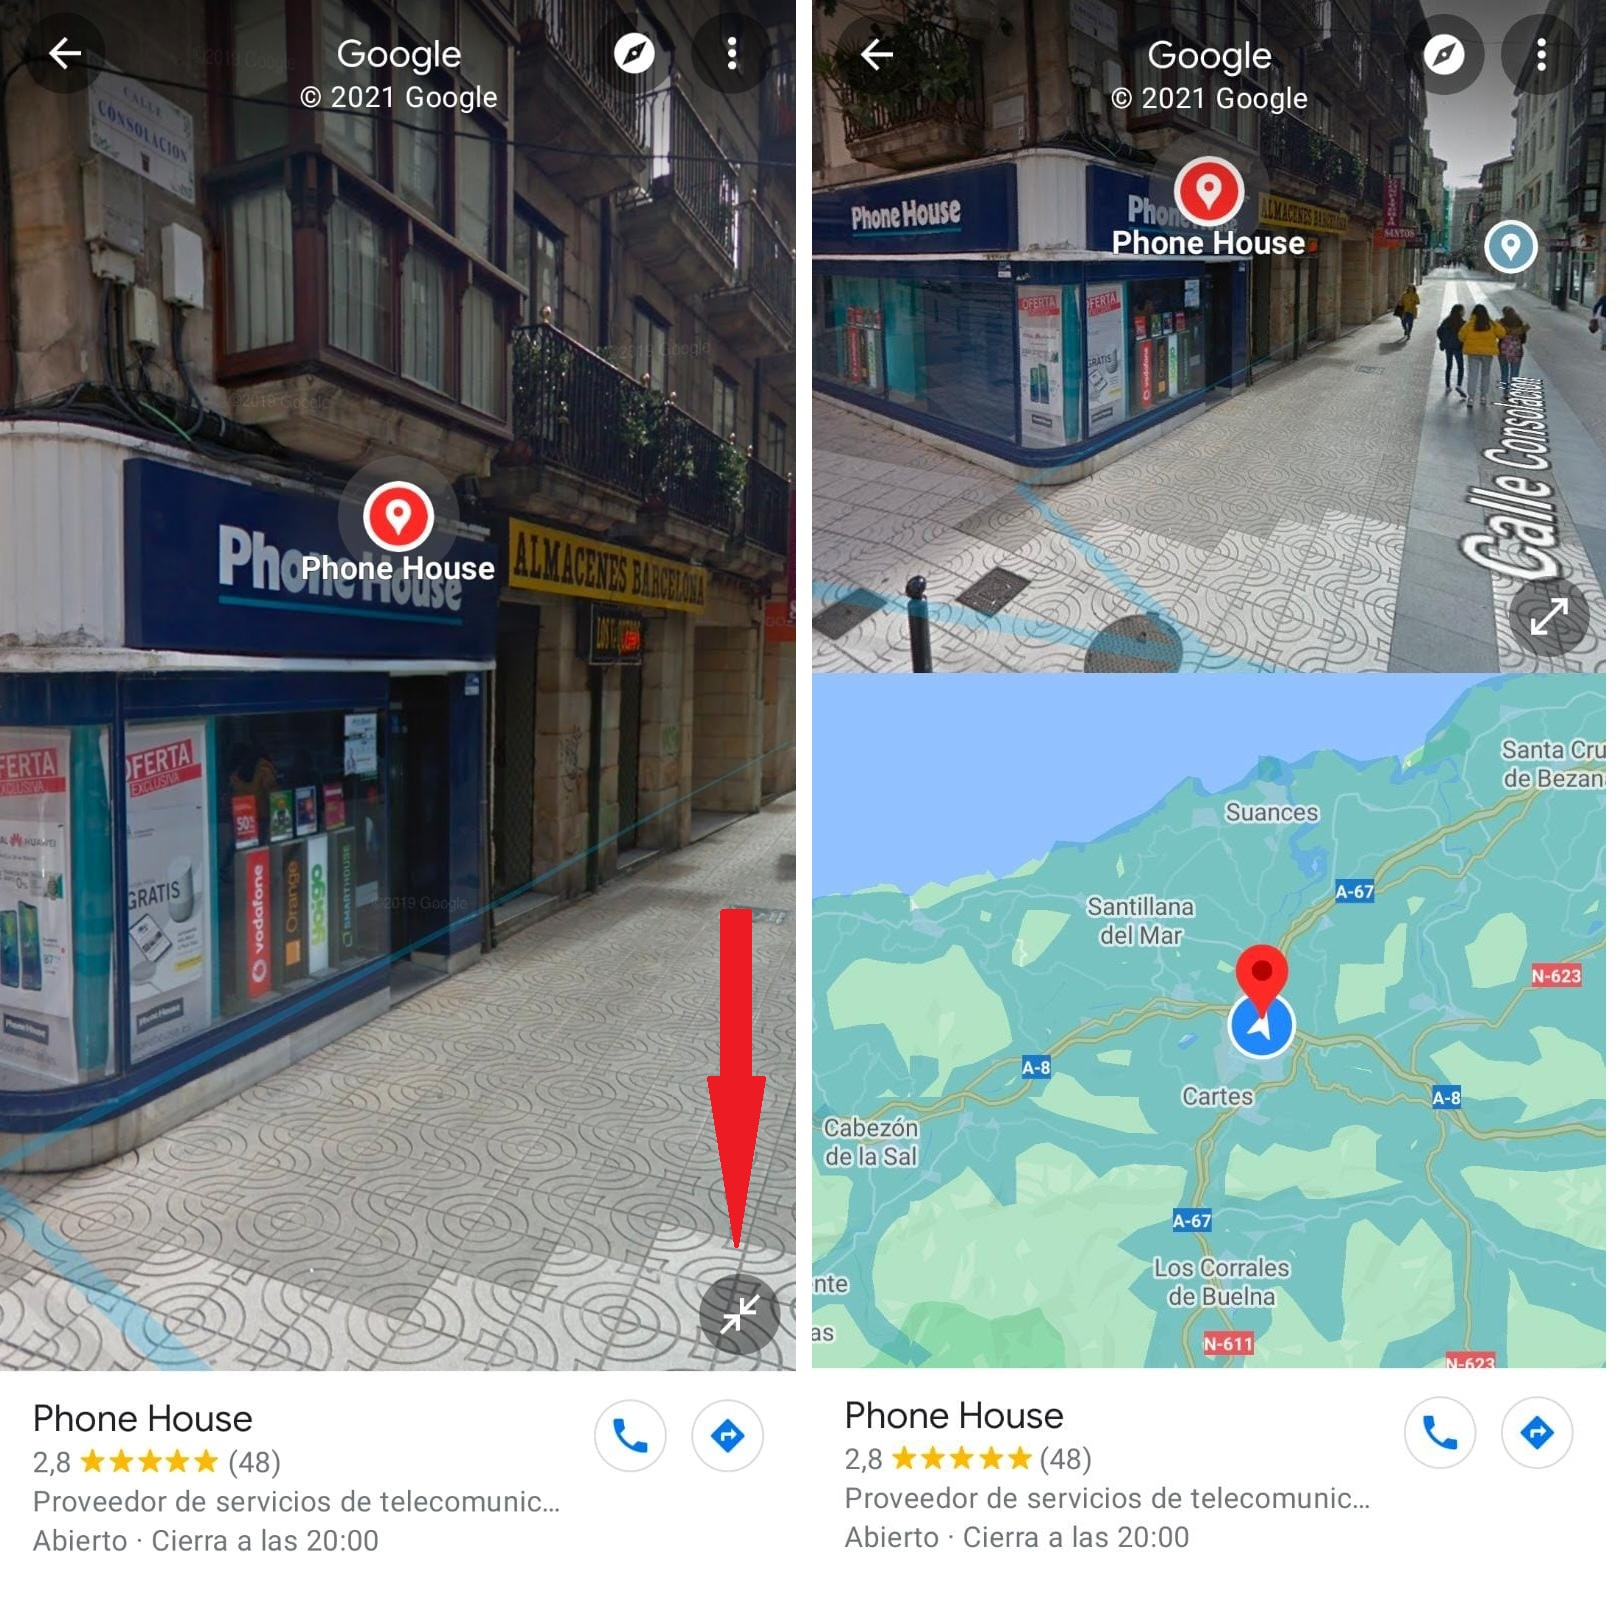 Google Maps Y Phone House 02